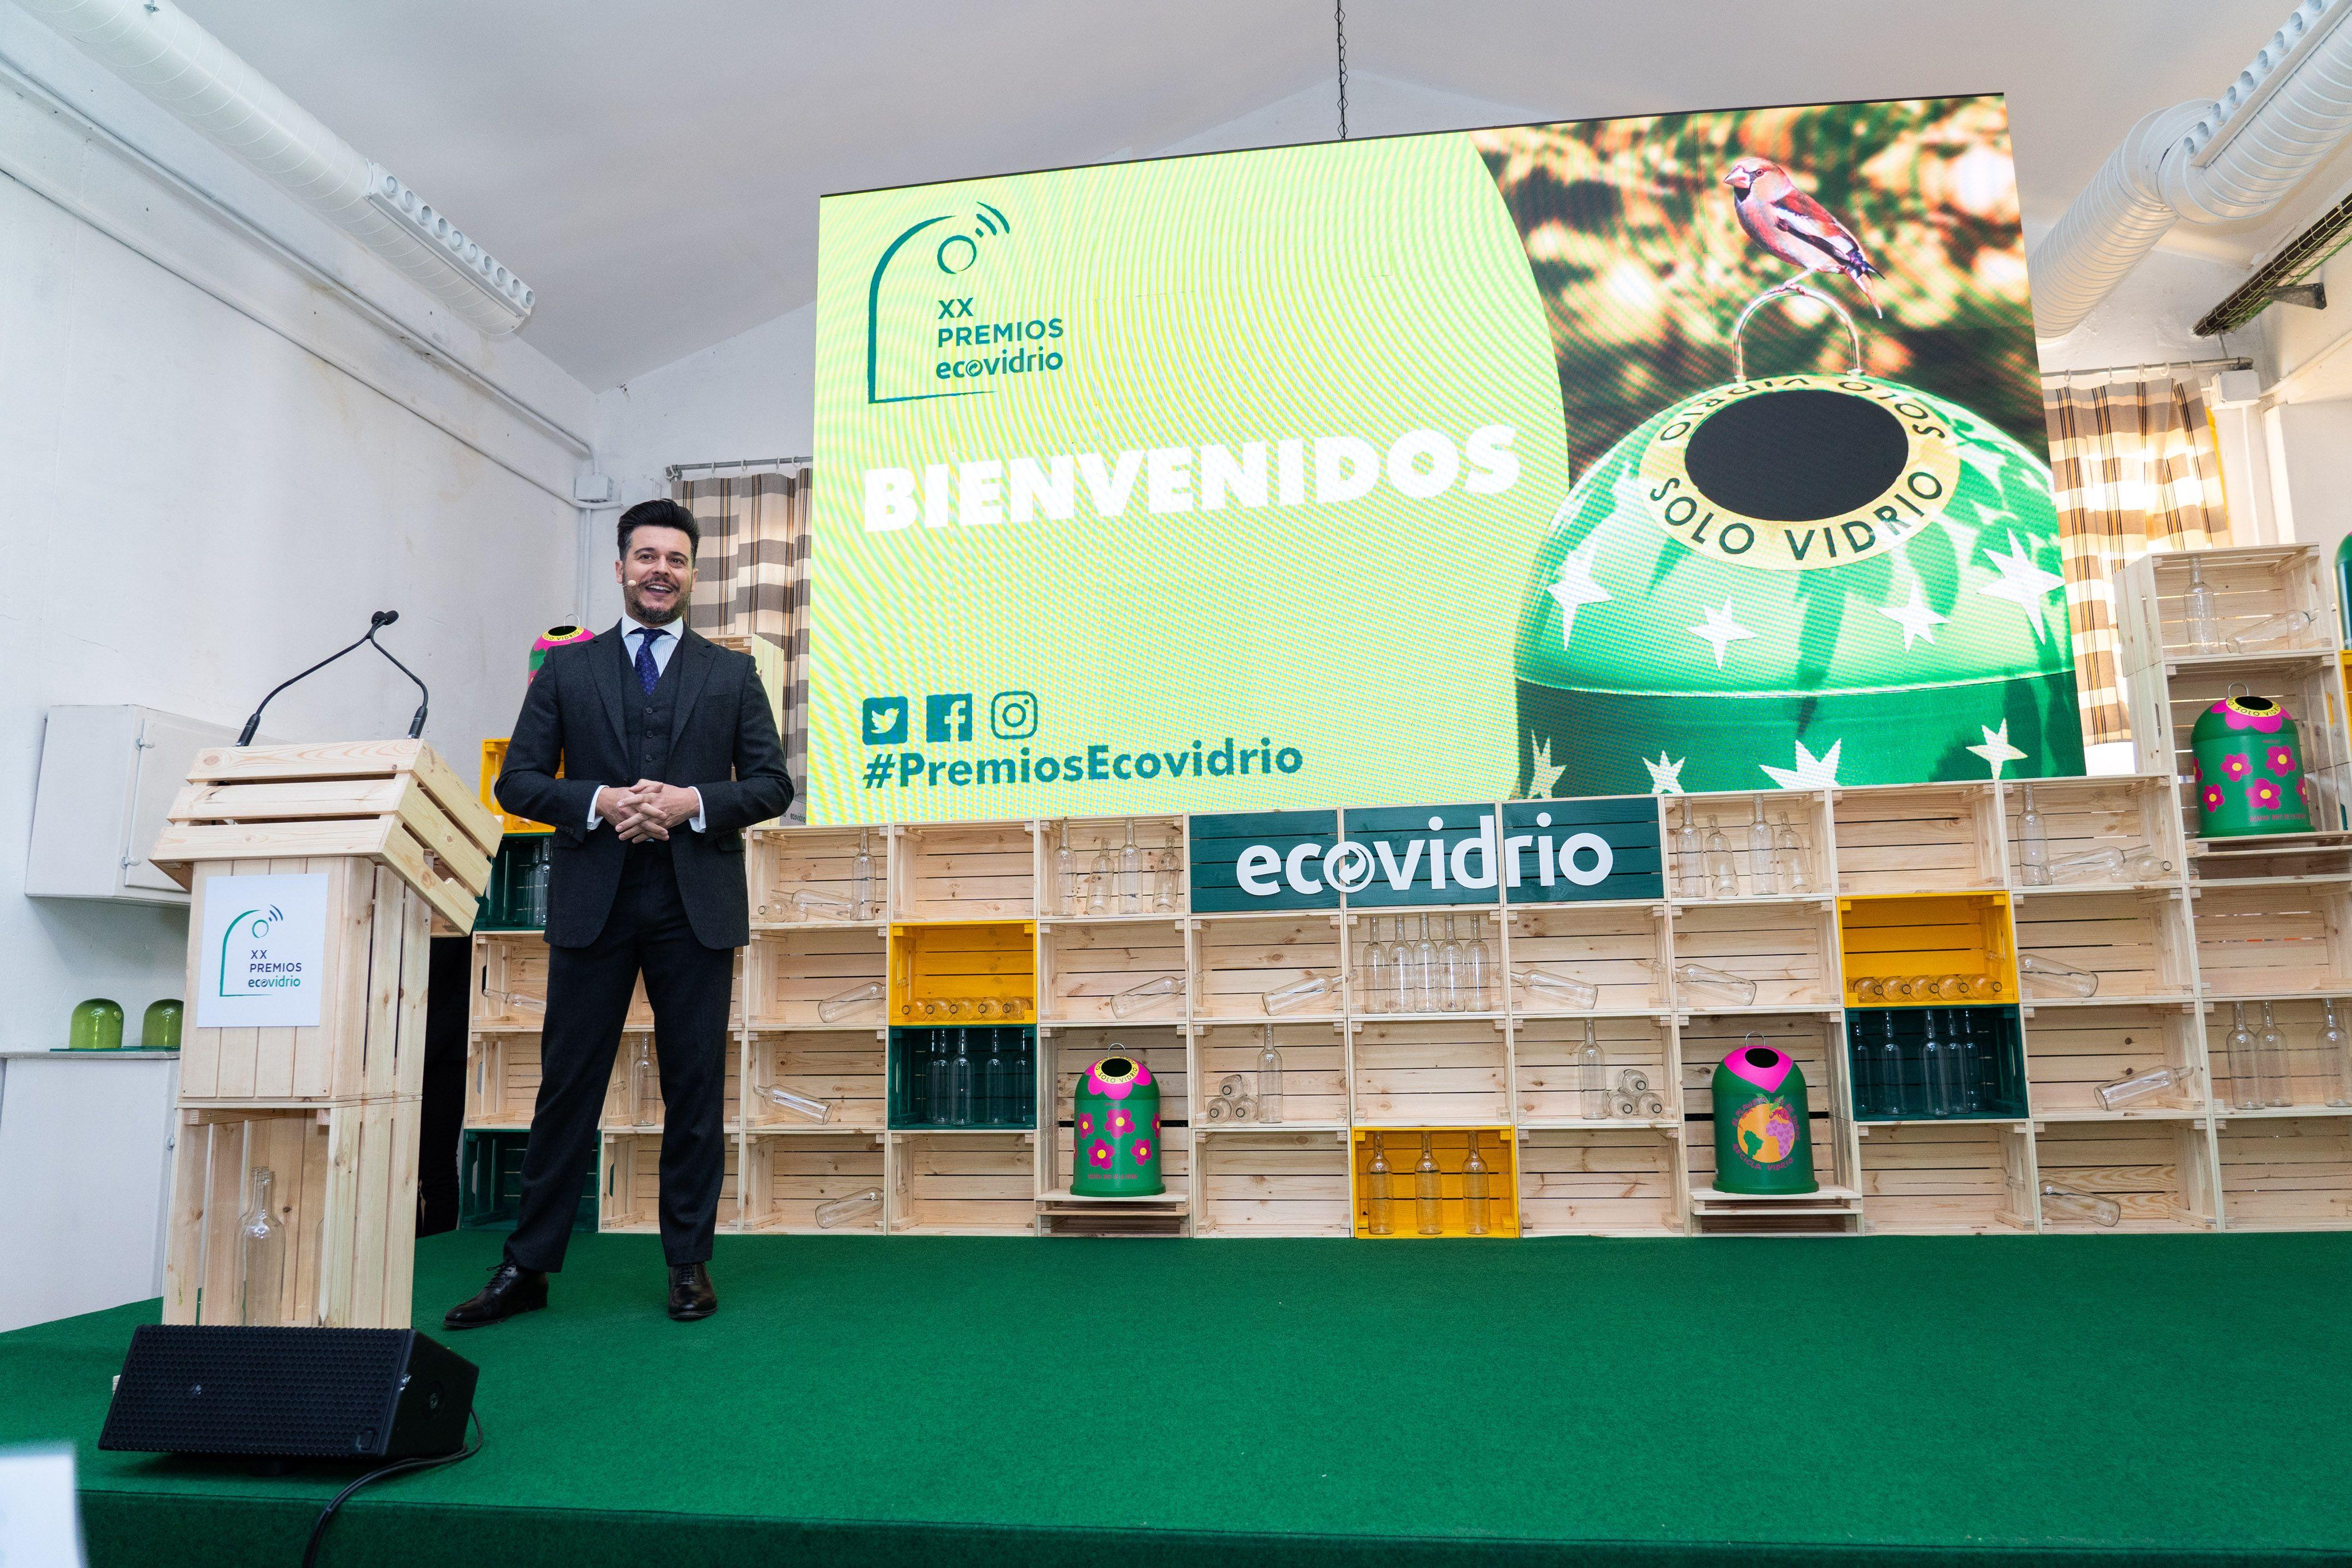 premios ecovidrio - martin barreiro